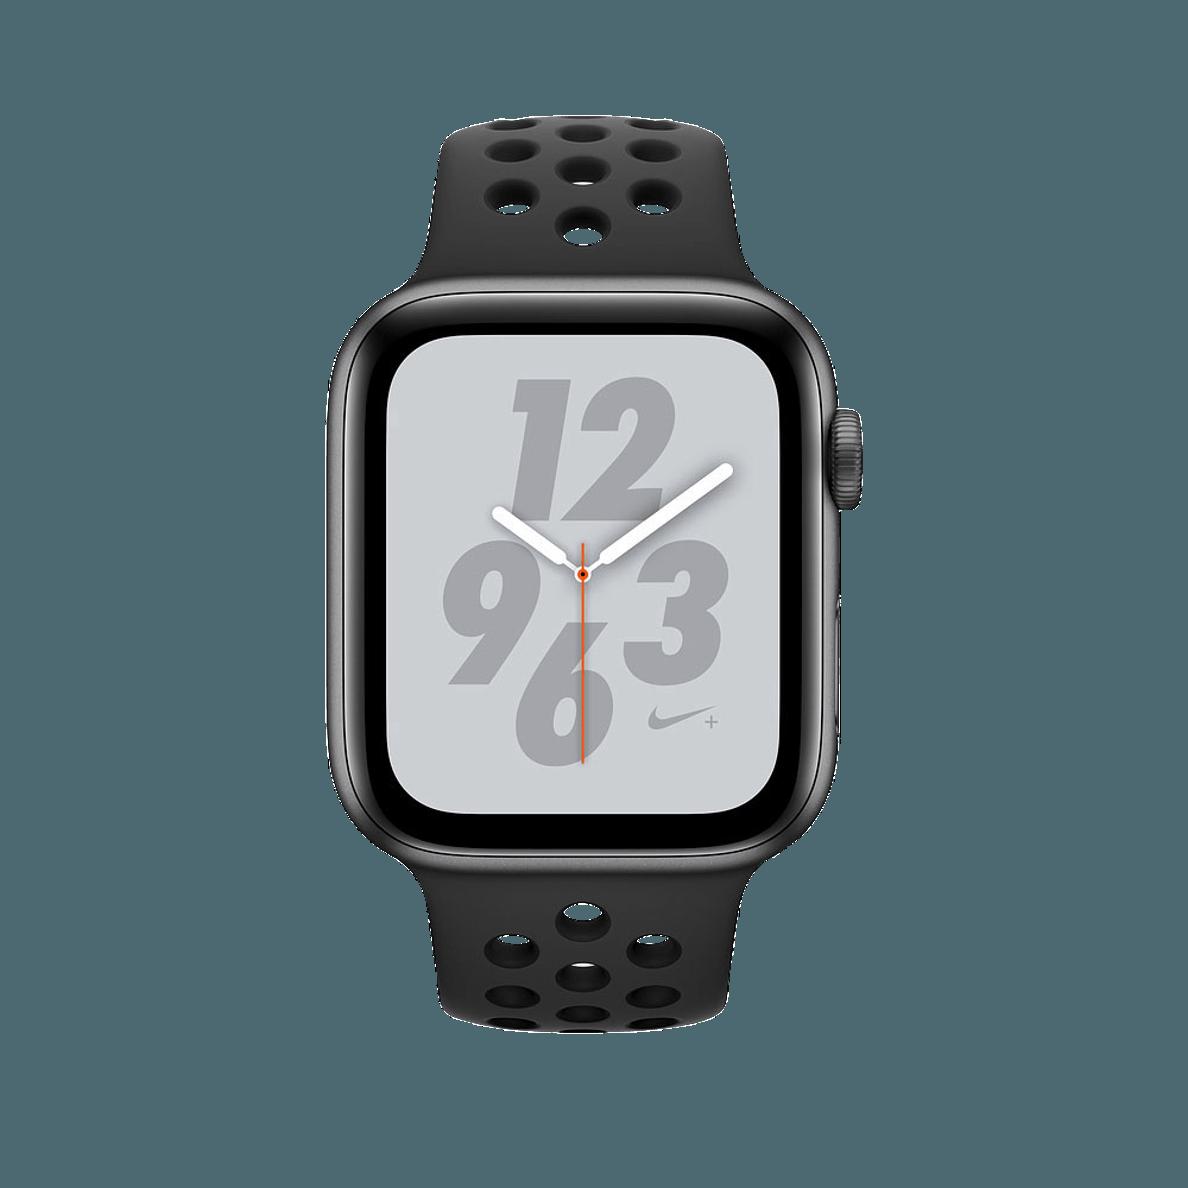 Apple Watch Series 4 Gps Cellular 44 Mm Smartwatch Kaufen Armband Kunststoff 145 220 Mm Farbe Armband Anthrazit Schwarz Smartwatch Gehause Apple Iphone 6